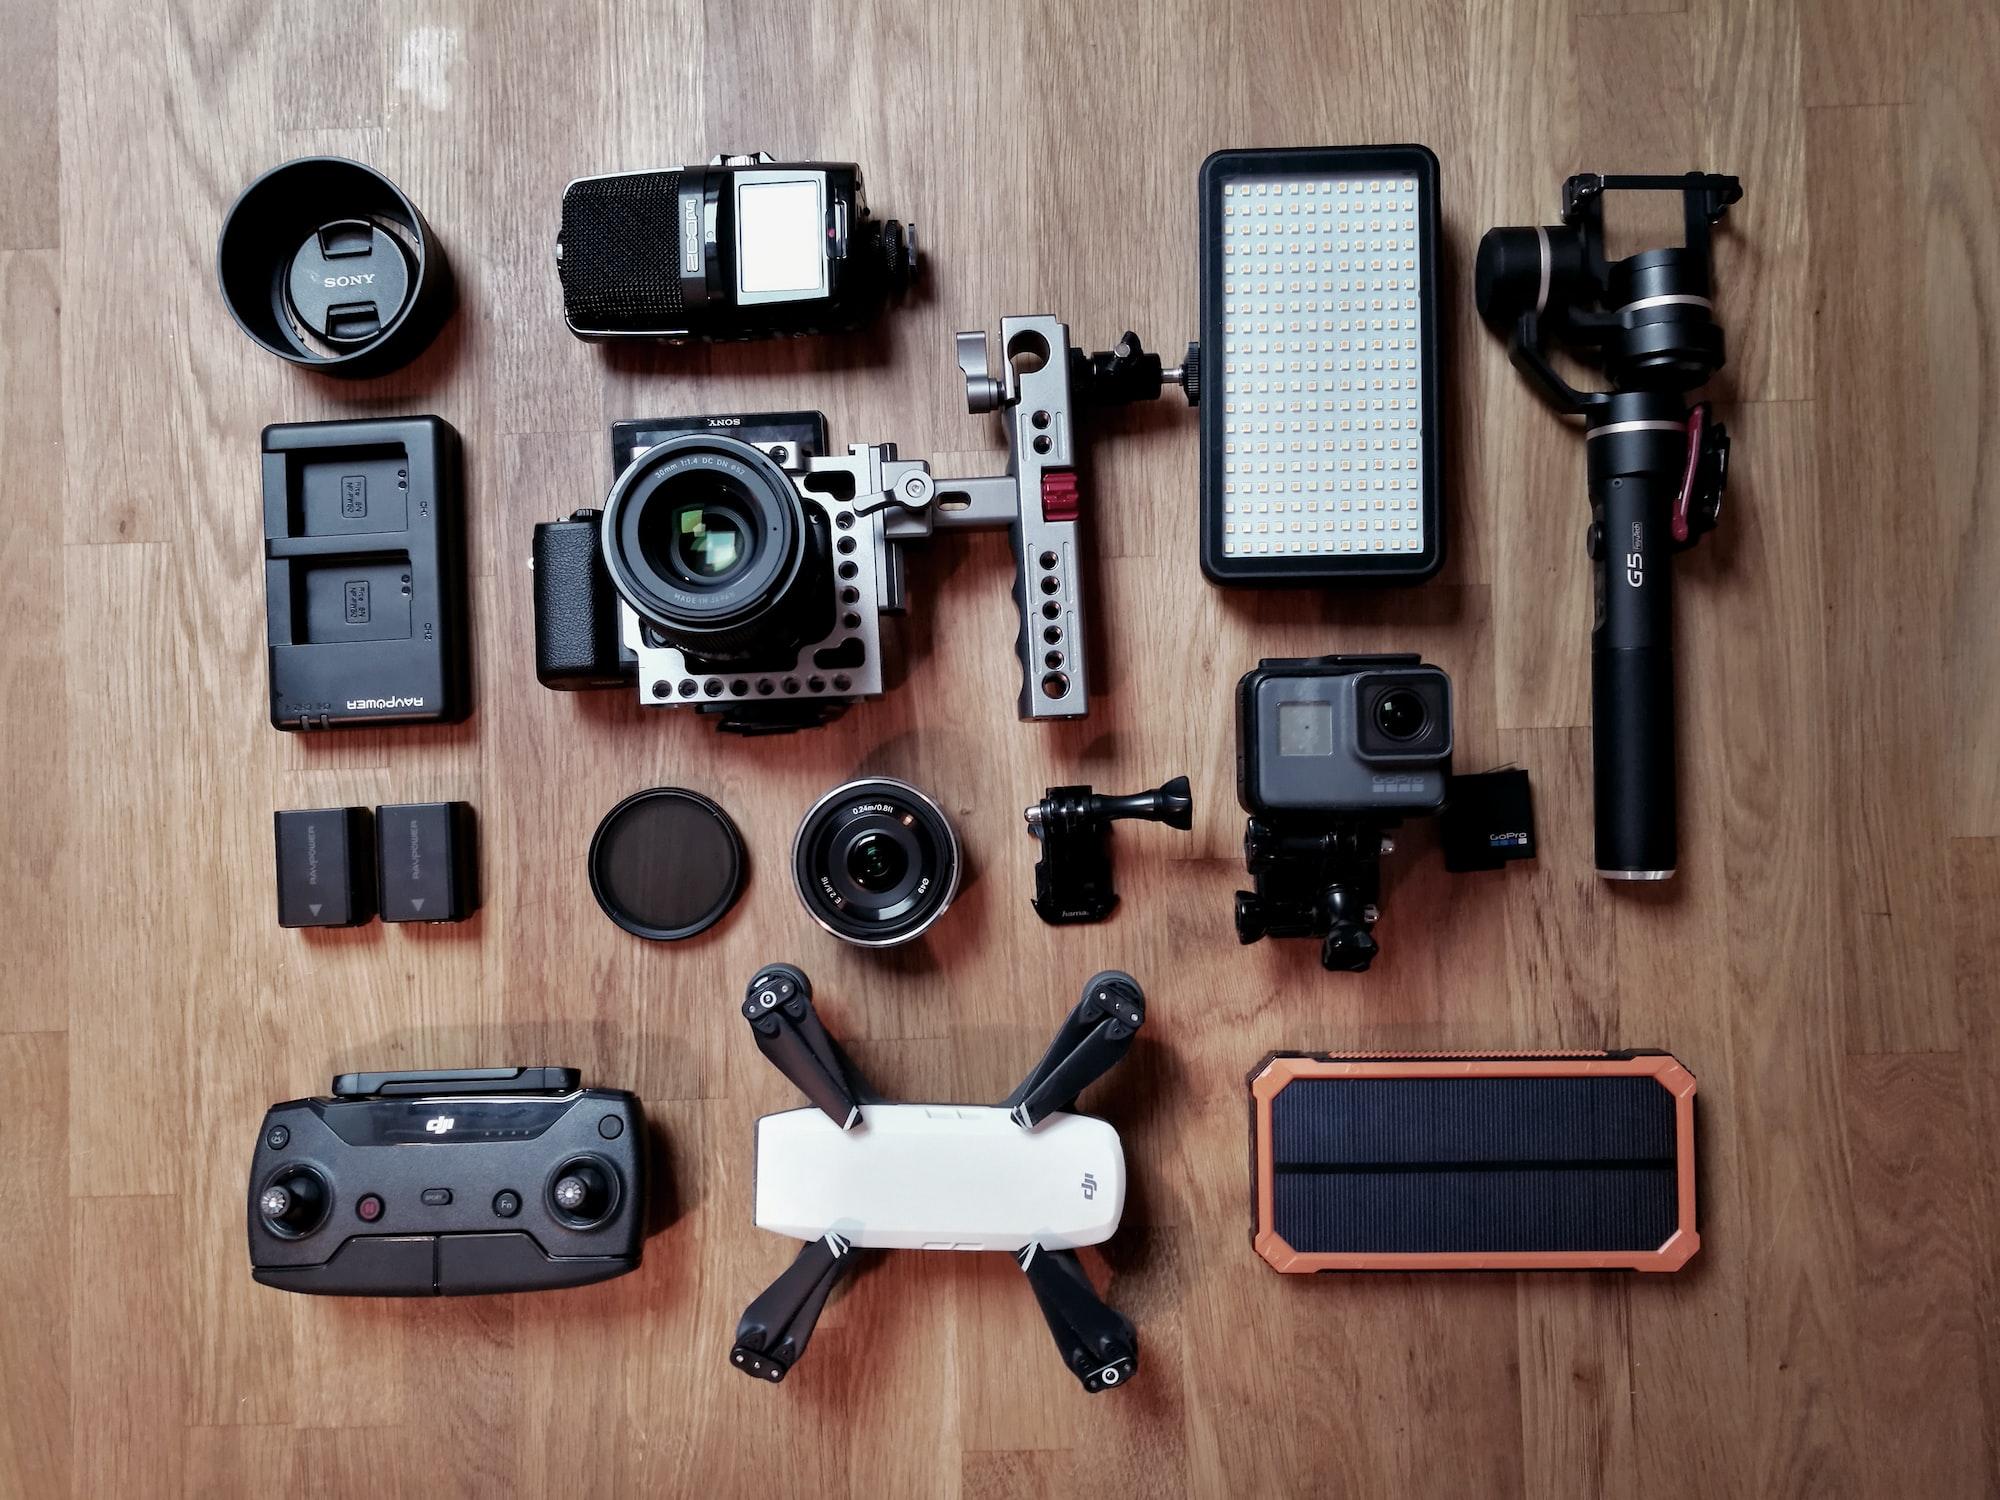 Is Equipment a Current Asset?